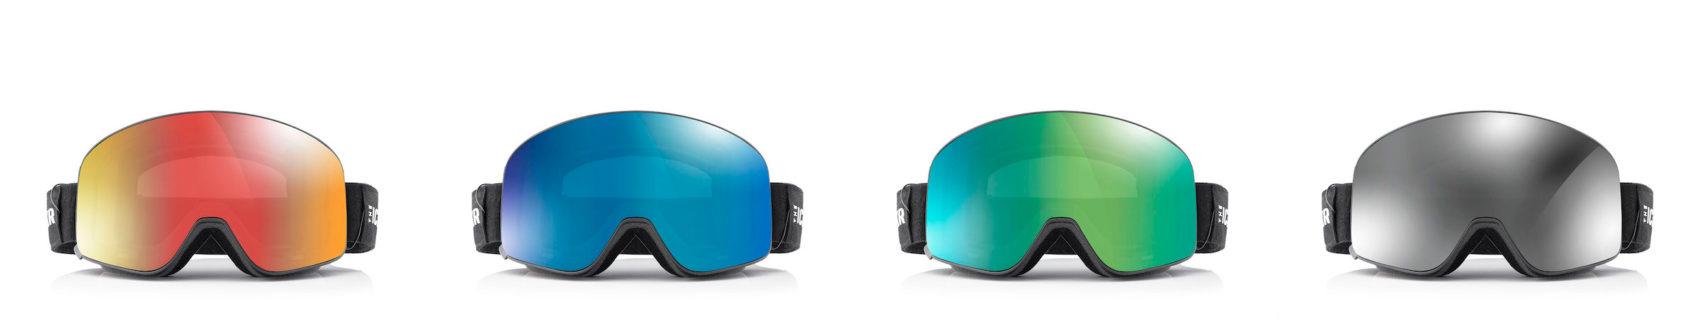 Ski goggles, IceBRkr colors offered, headphones